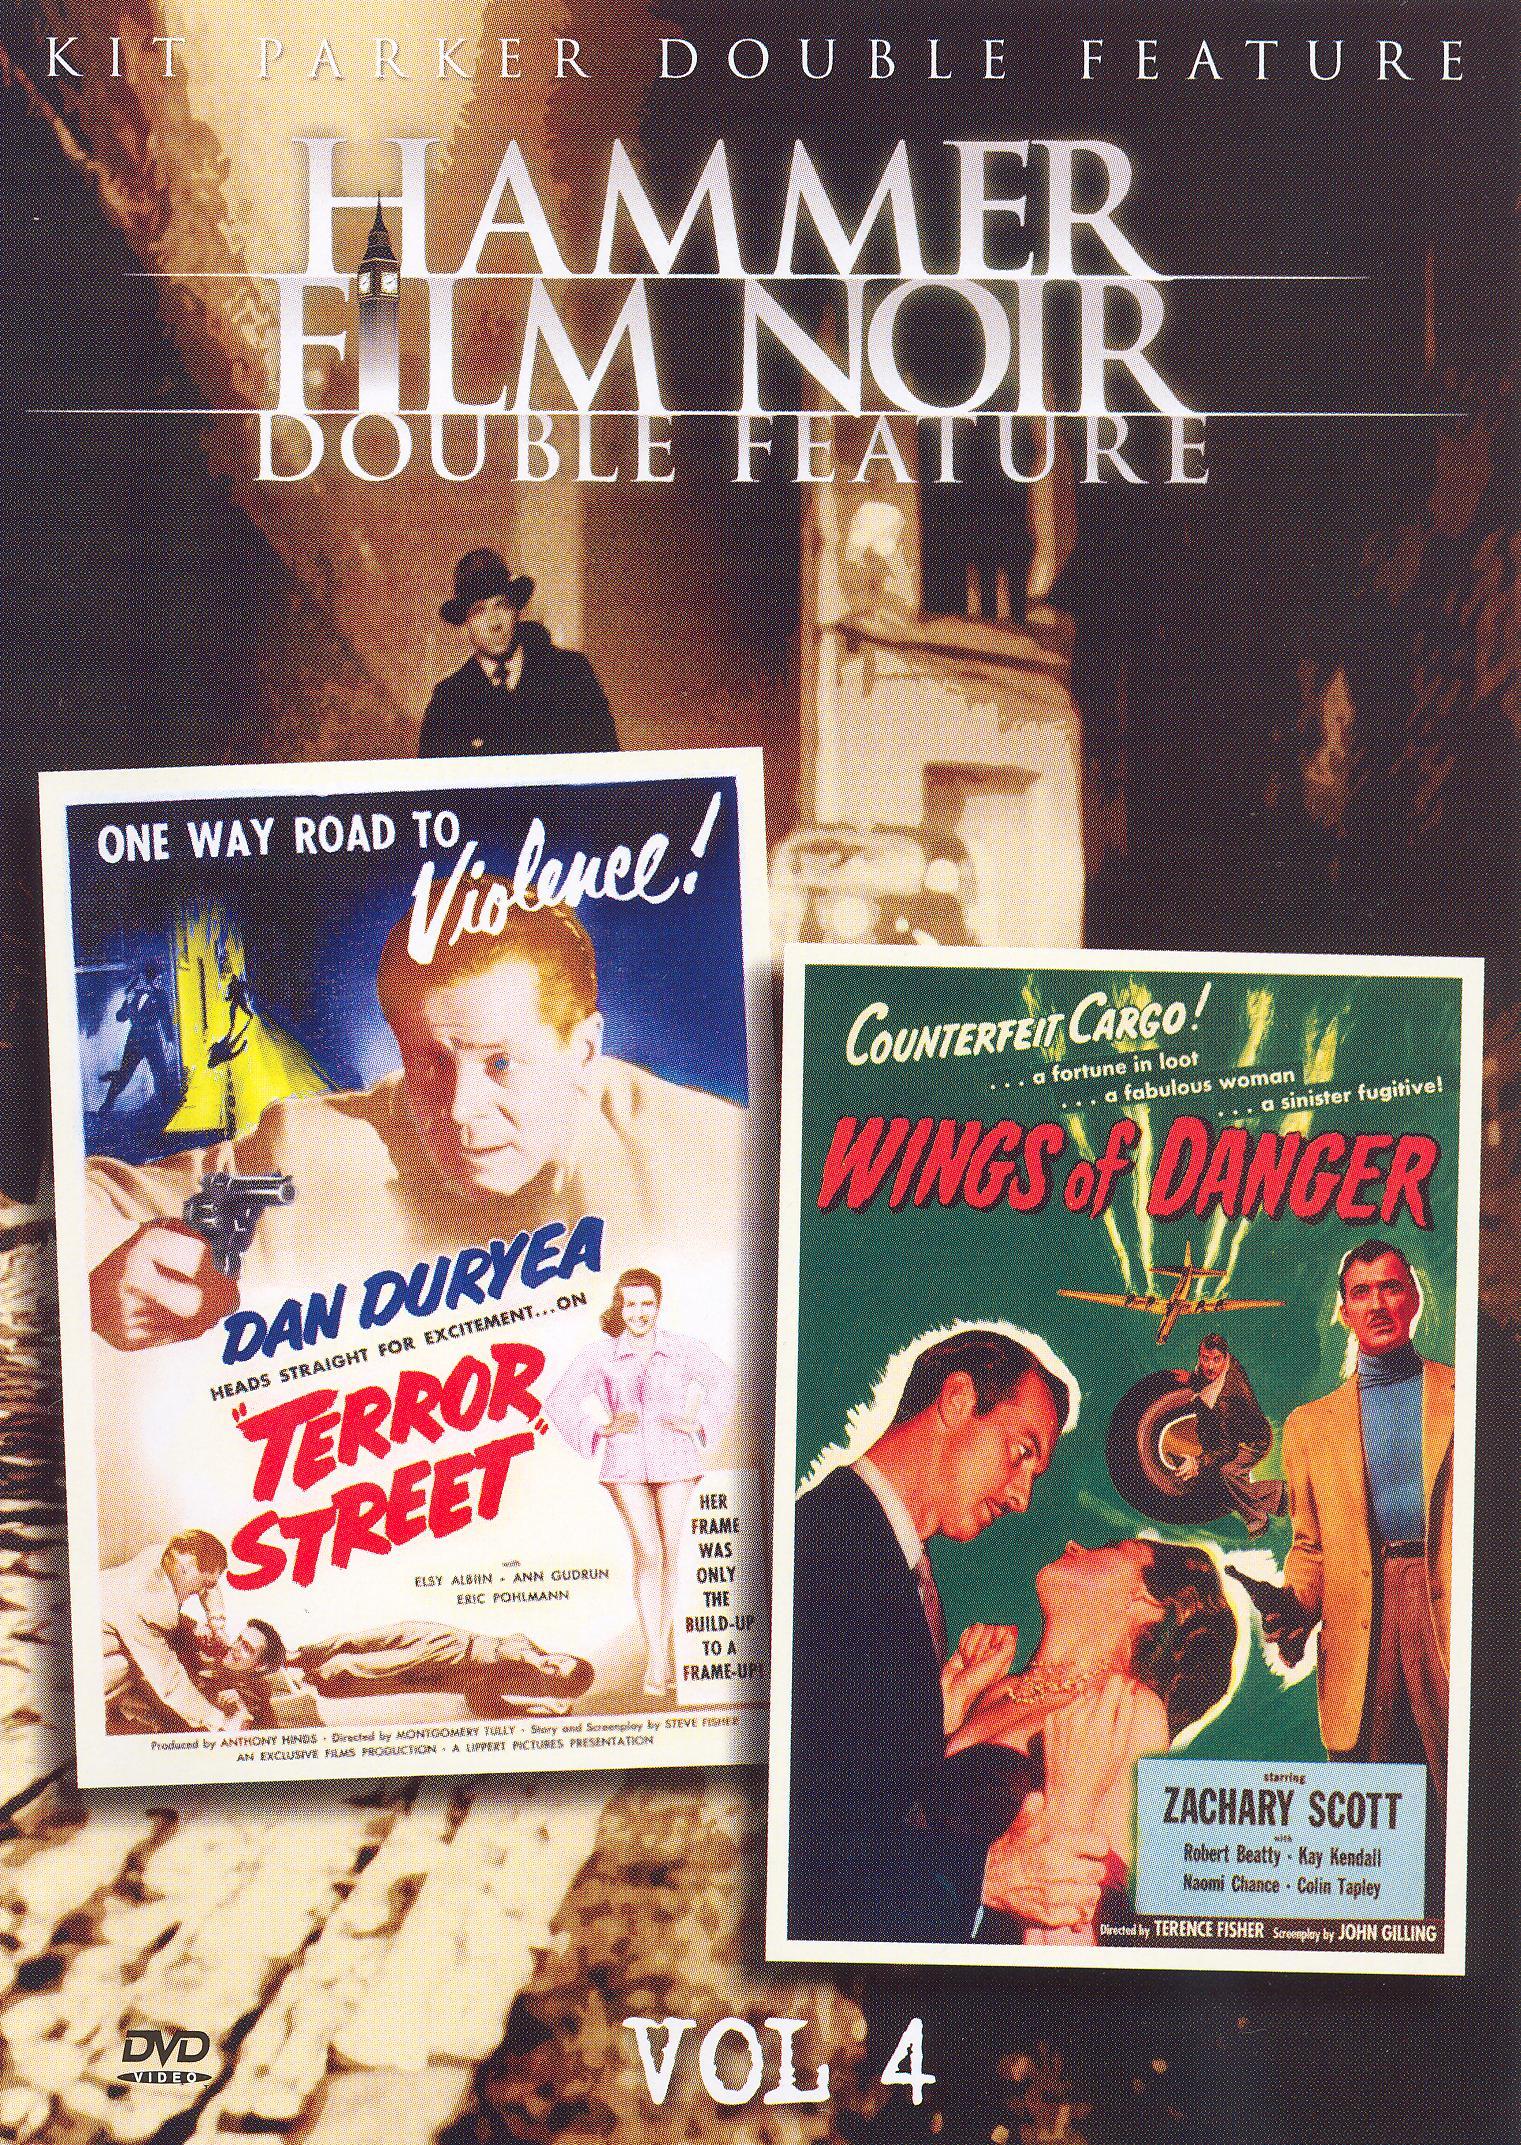 Hammer Film Noir Double Feature, Vol. 4 (dvd) 15335558